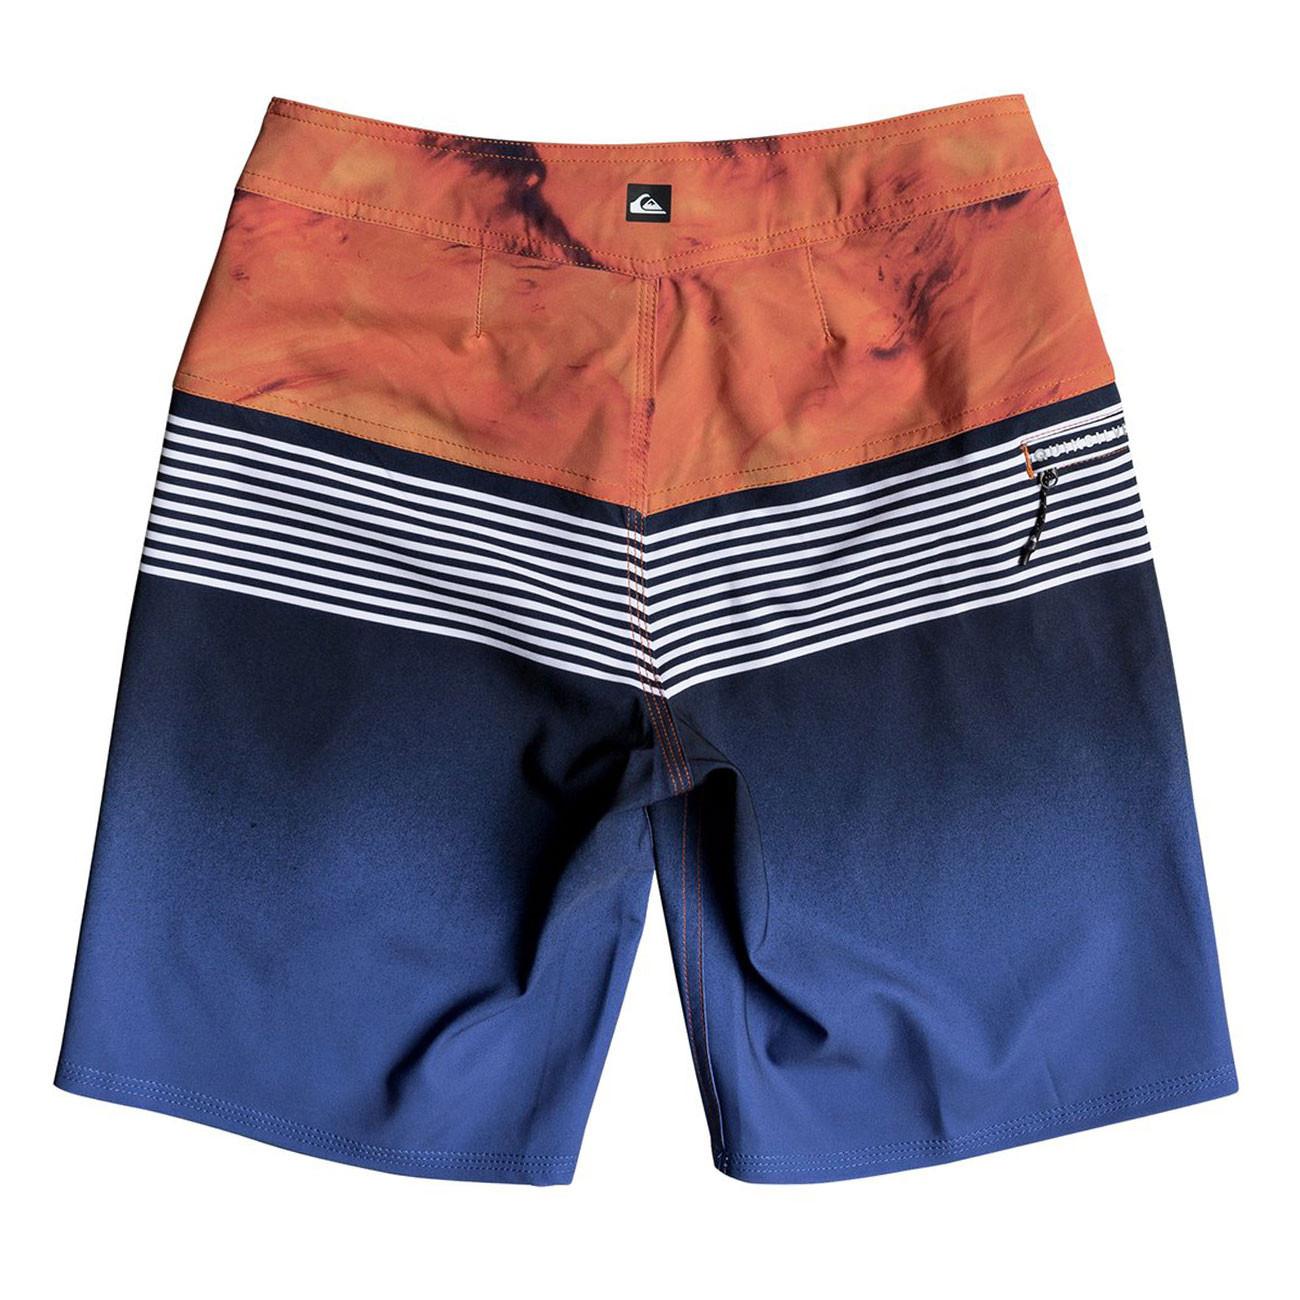 9a3337766b Boardshorts Quiksilver Highline Lava Division Y17 navy blazer | Snowboard  Zezula